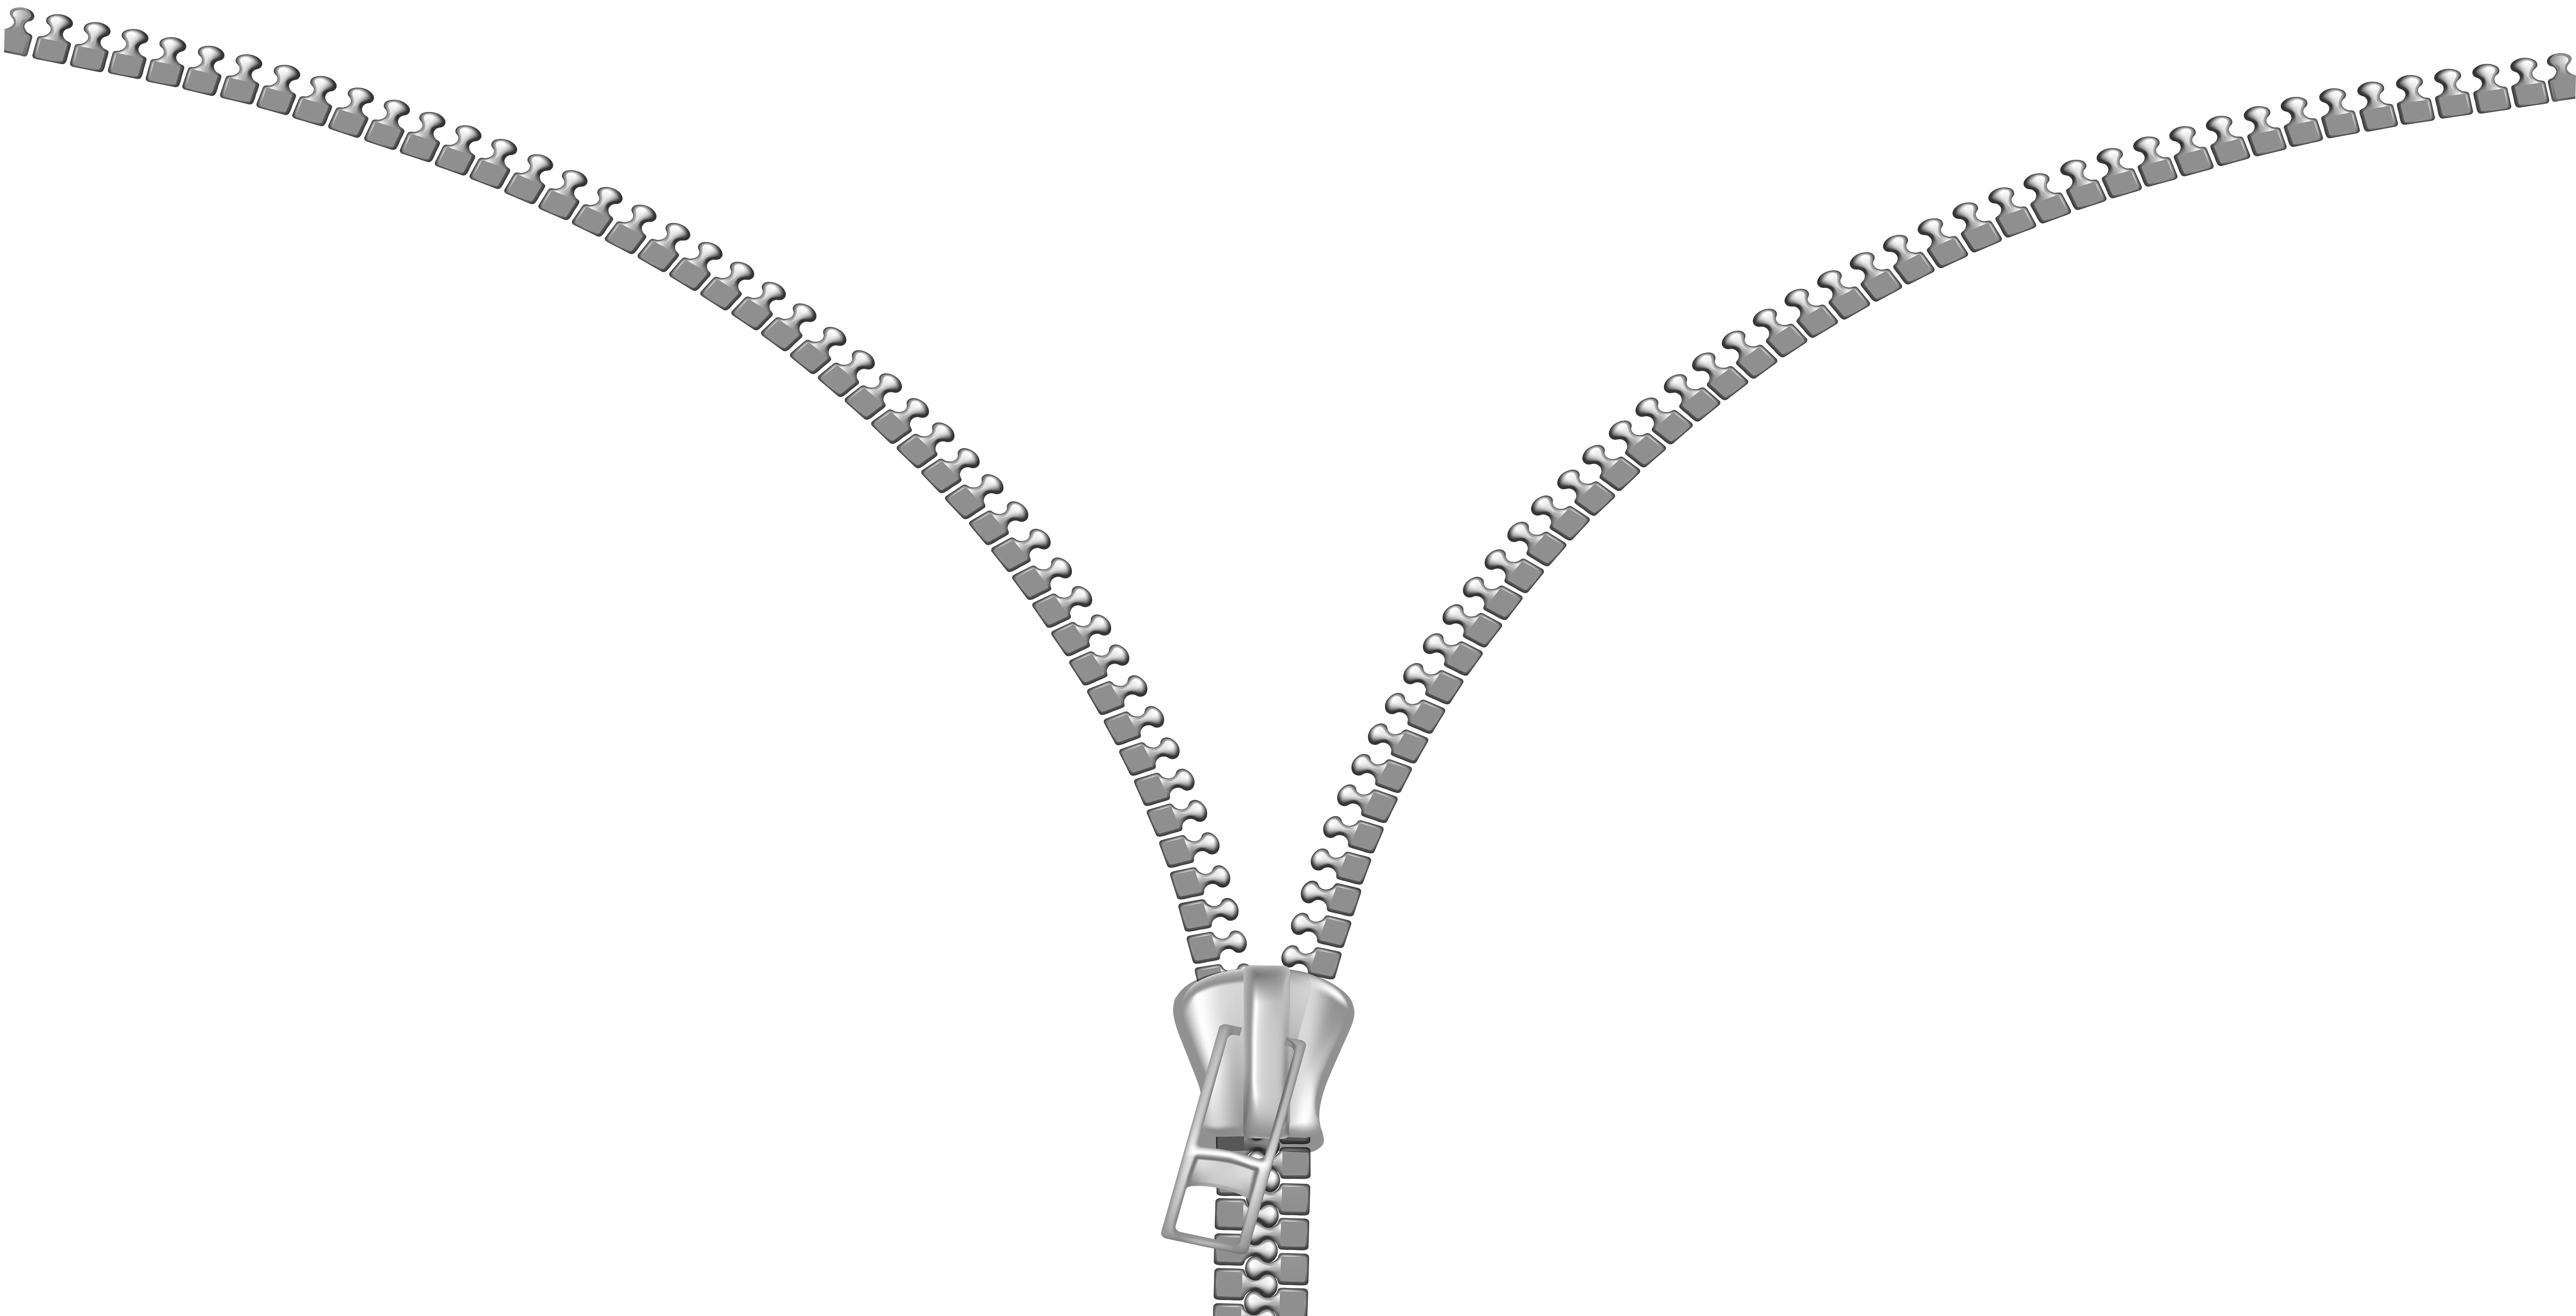 Zipper clipart clip art. Open png transparent image